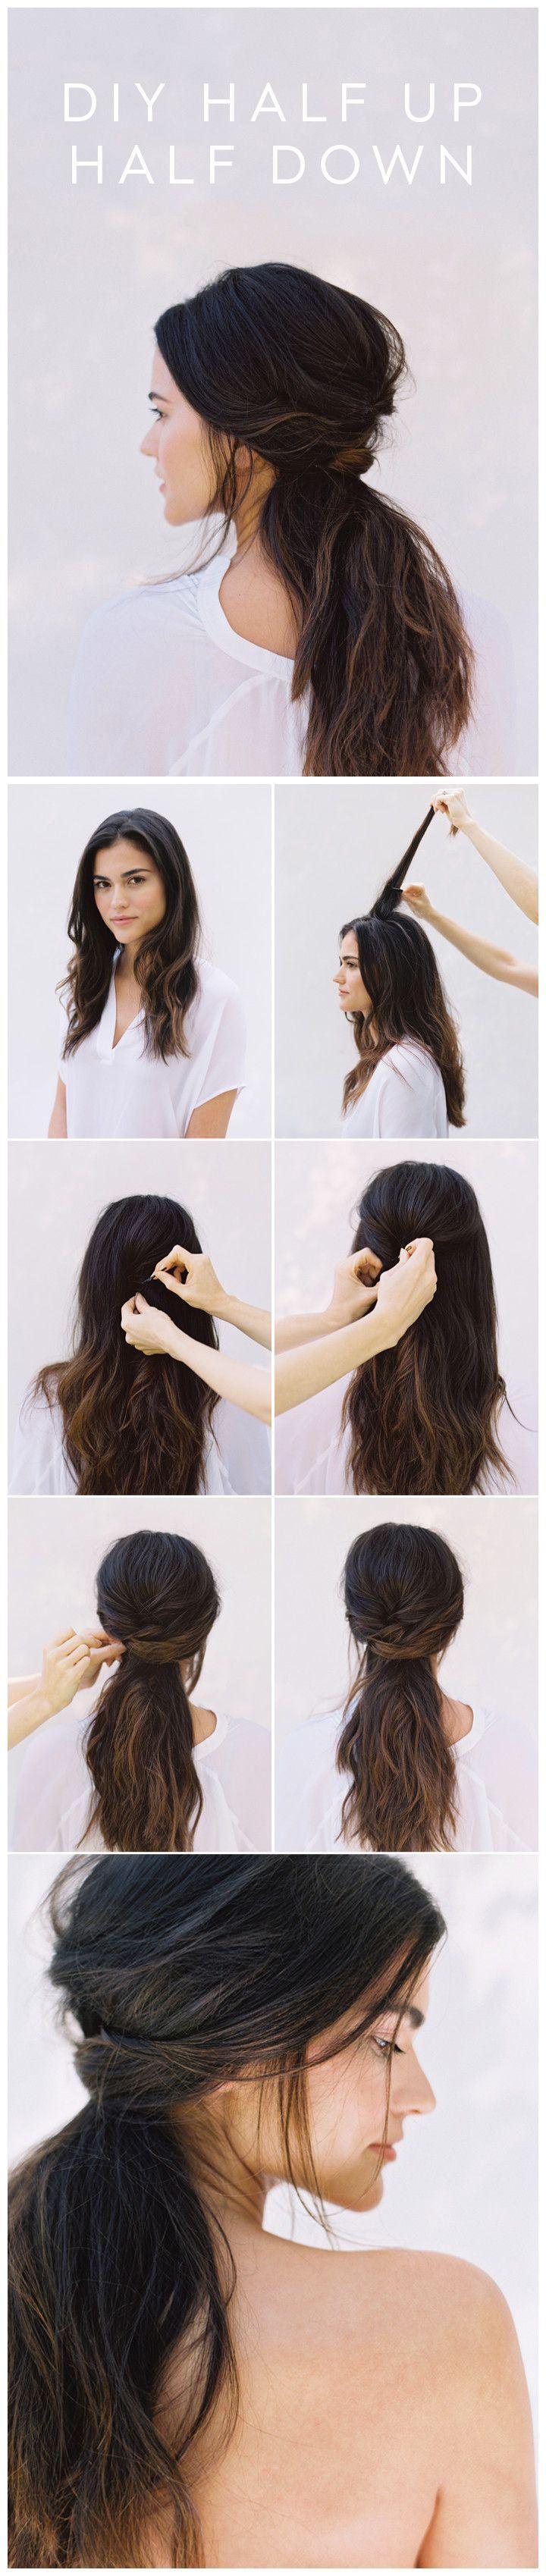 DIY HALF UP HALF DOWN HAIR   wedding   Pinterest   Hair style ...